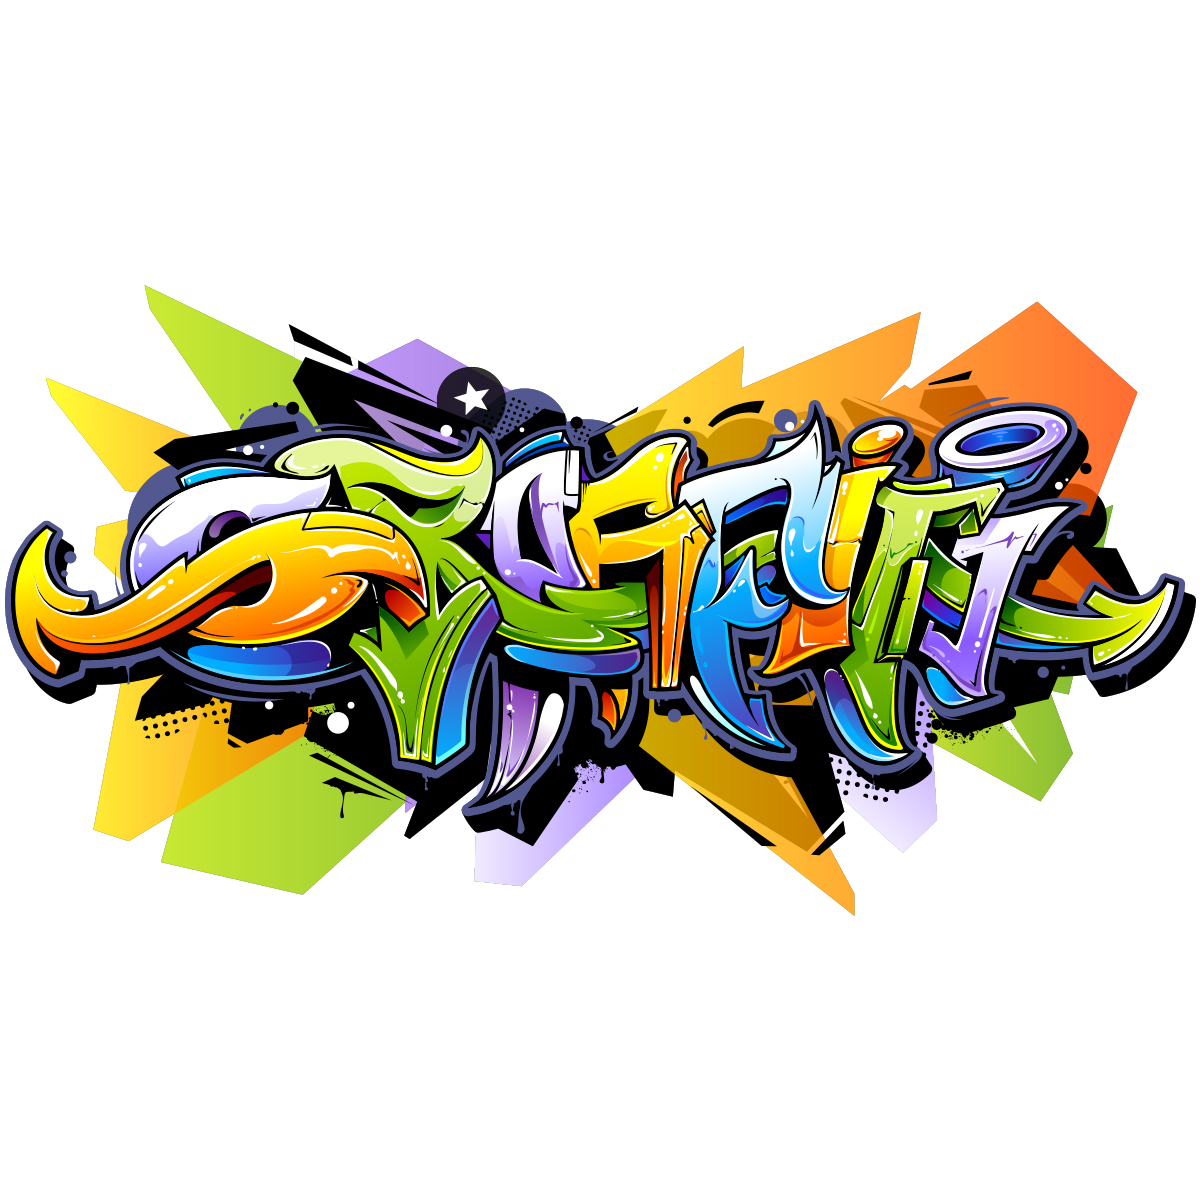 Graffiti Stickers For Walls Sticker Graffiti Multi Couleurs Stickers Art Et Design